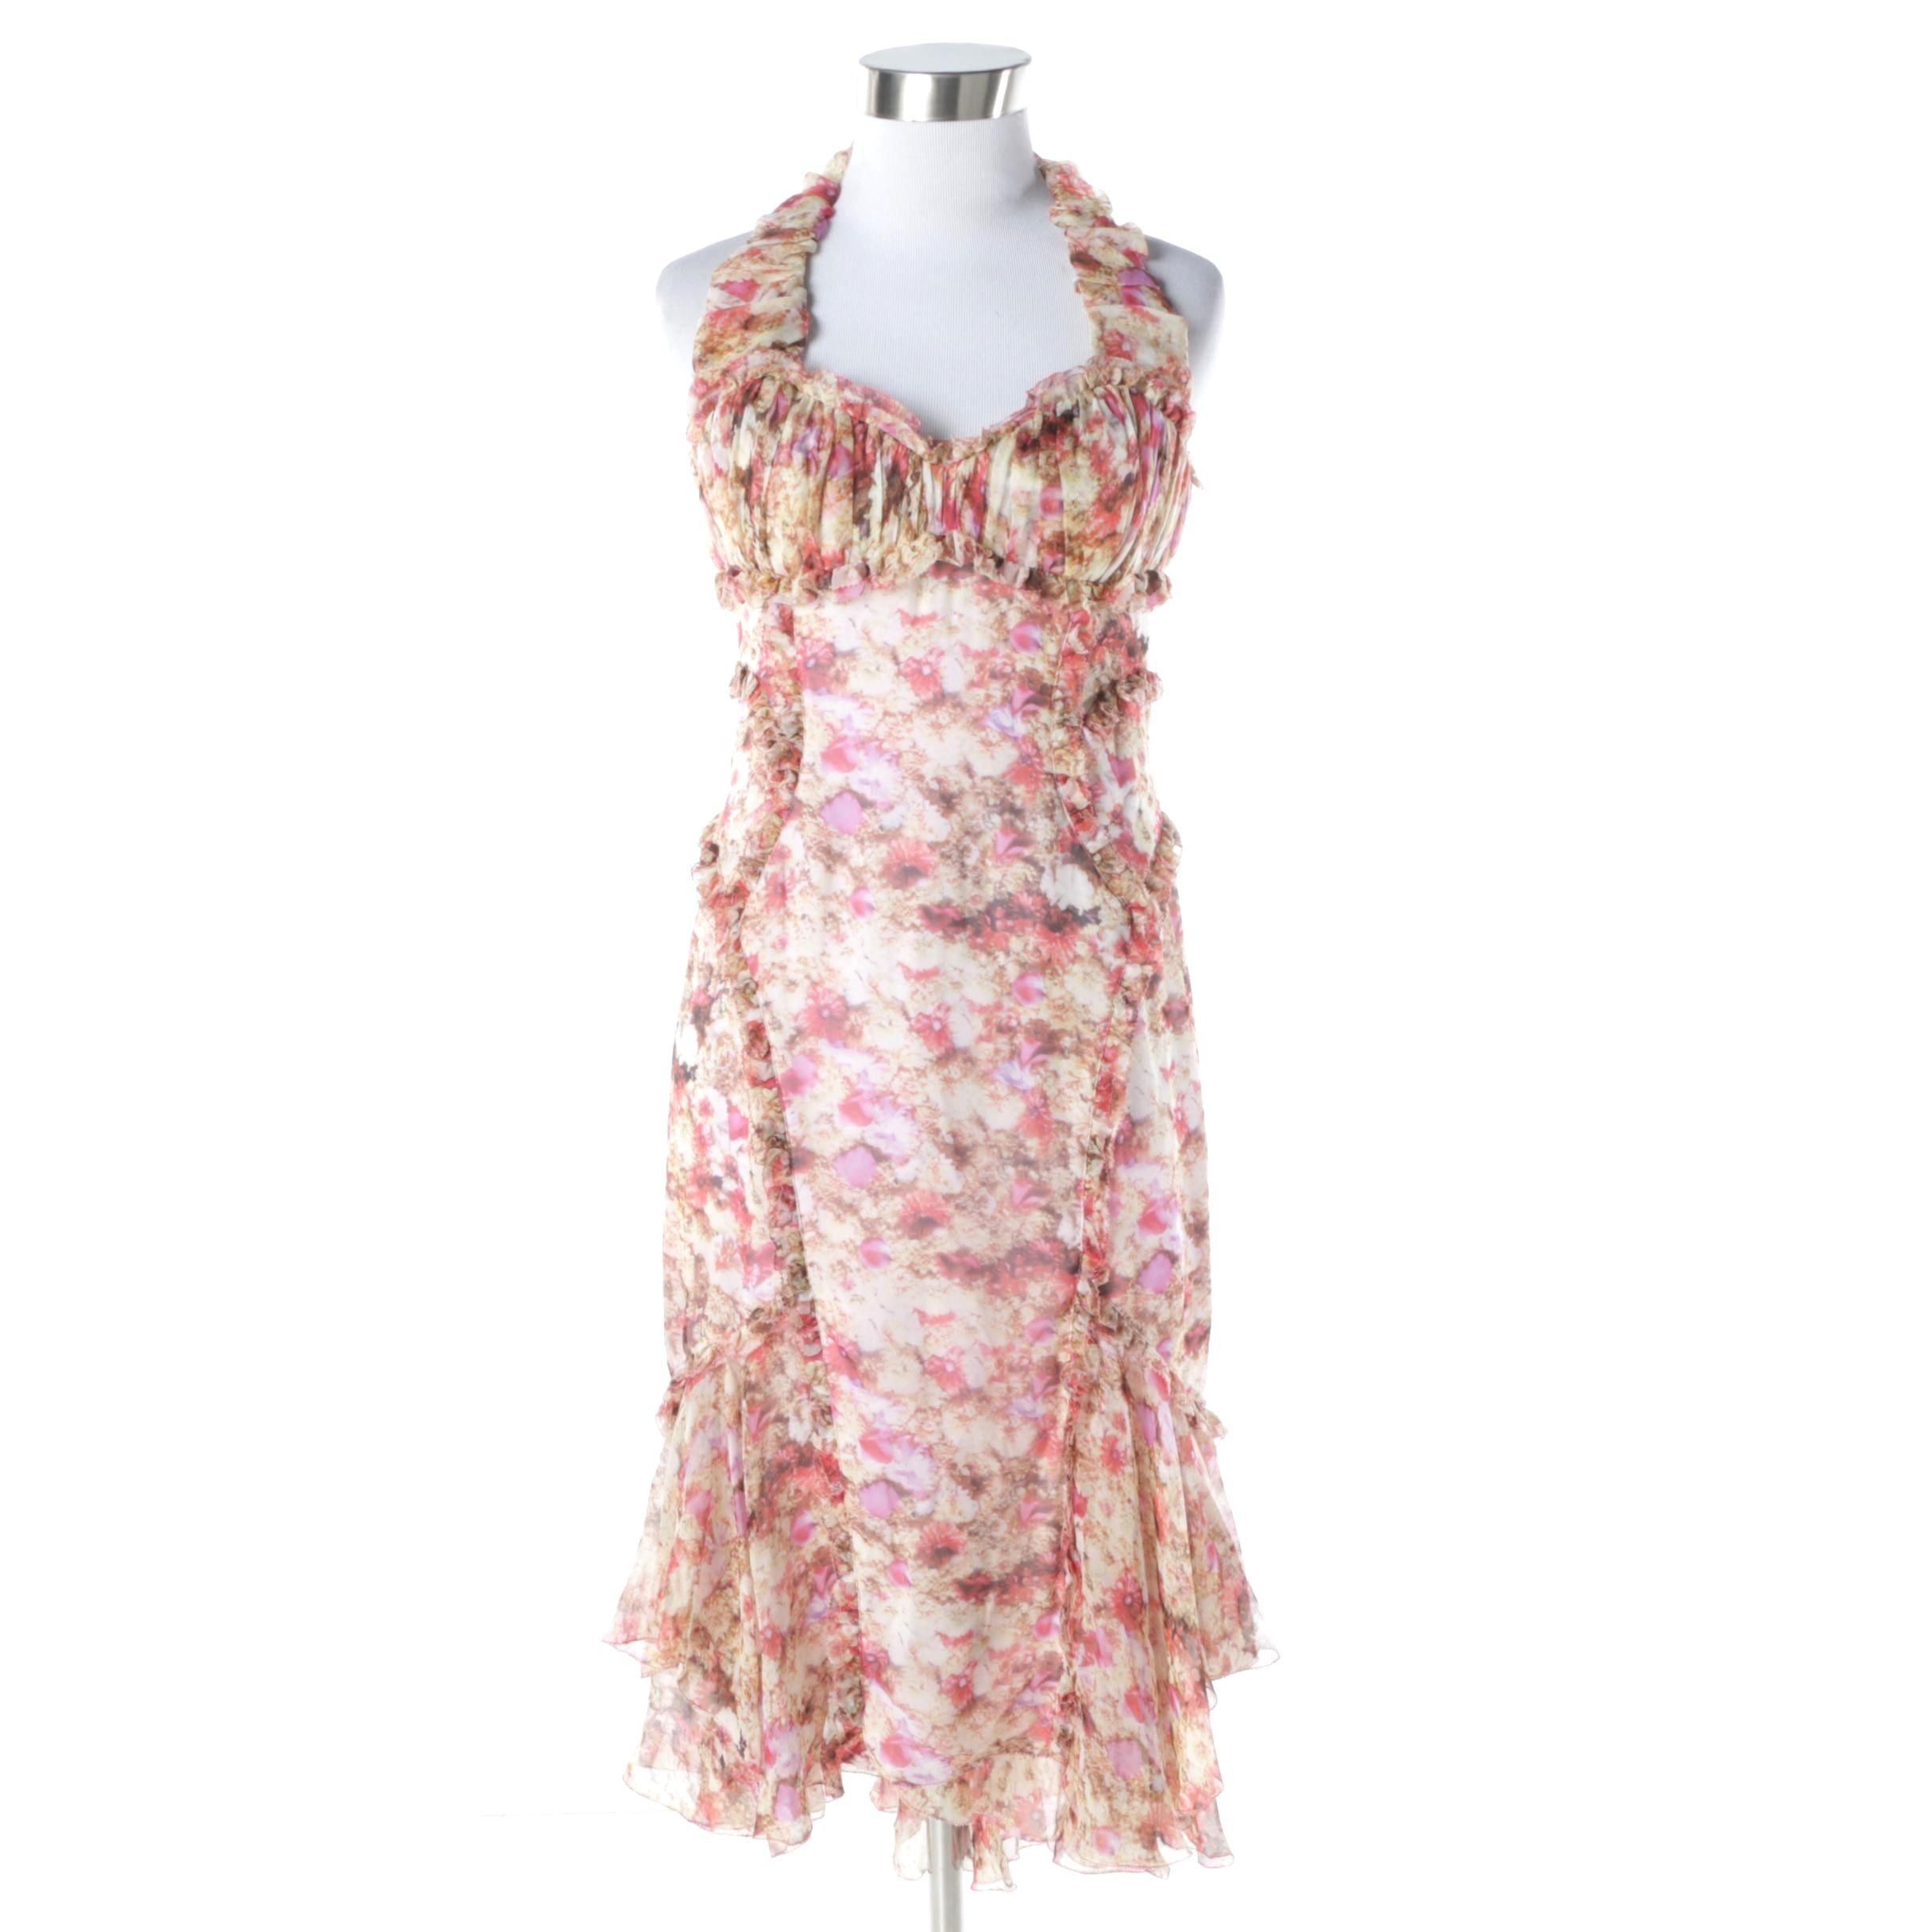 Zac Posen Garden Print Silk Chiffon Siren Dress